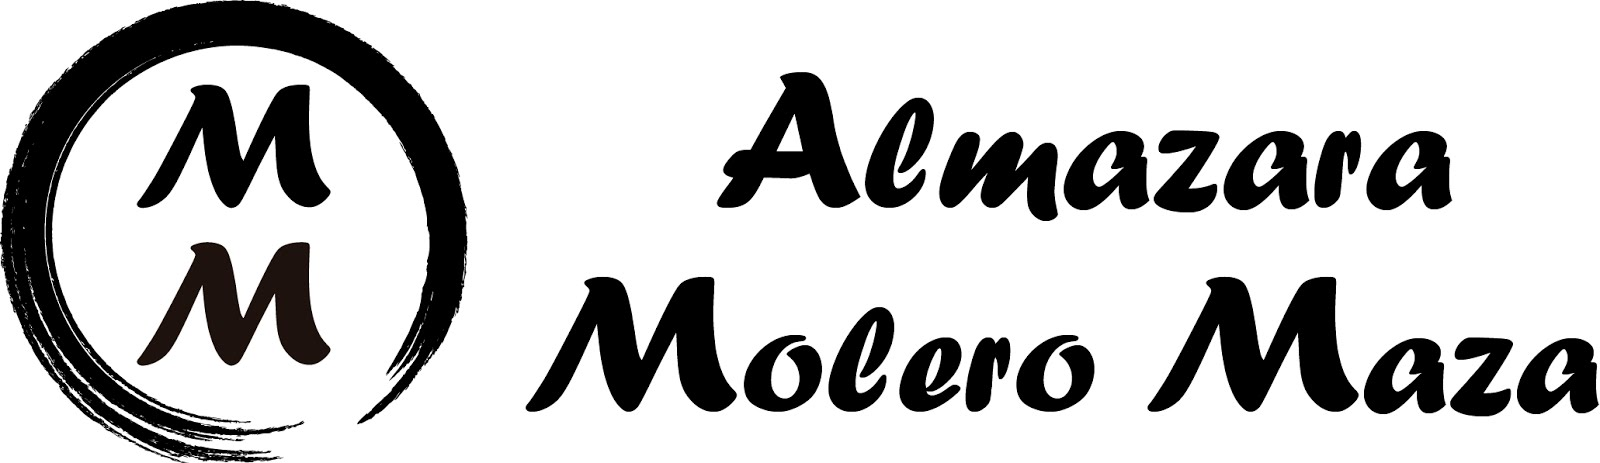 ALMAZARA MOLERO MAZA